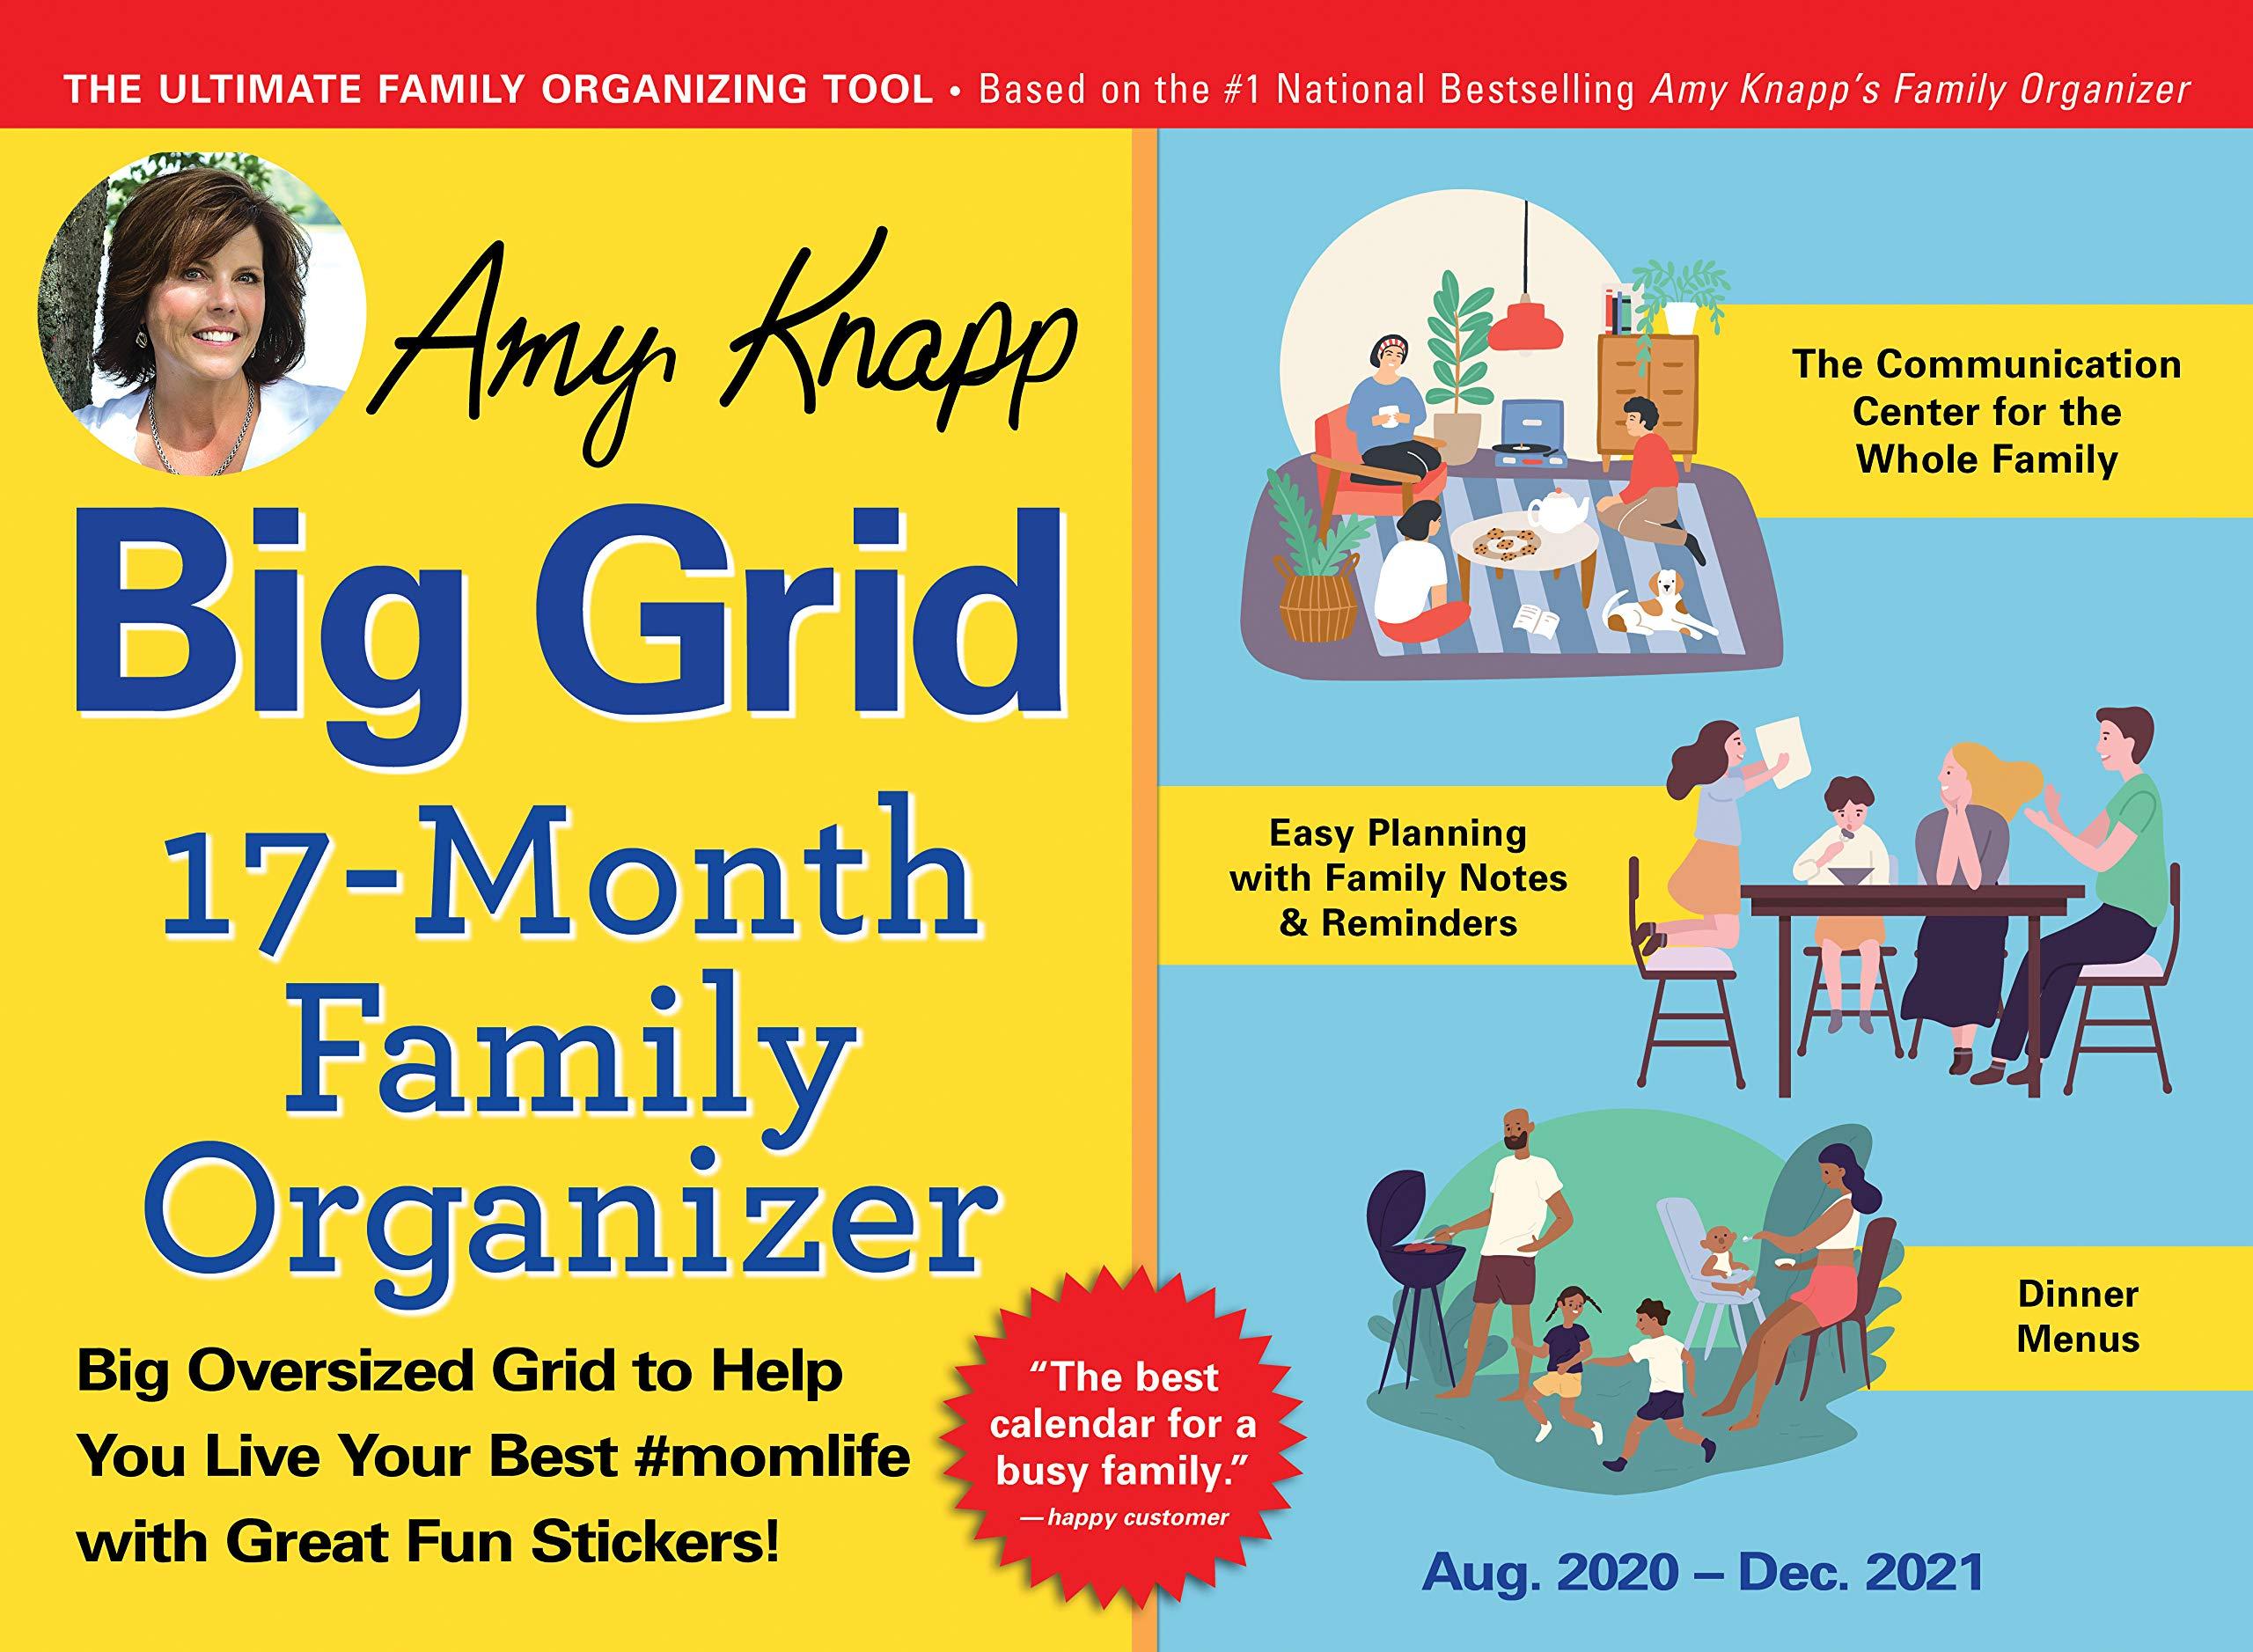 Image for 2021 Amy Knapp's Big Grid Family Organizer Wall Calendar: 17-Month Giant Fridge Calendar for Mom with 225+ Stickers (Hanging Family Plan Calendar, Thru December 2021)